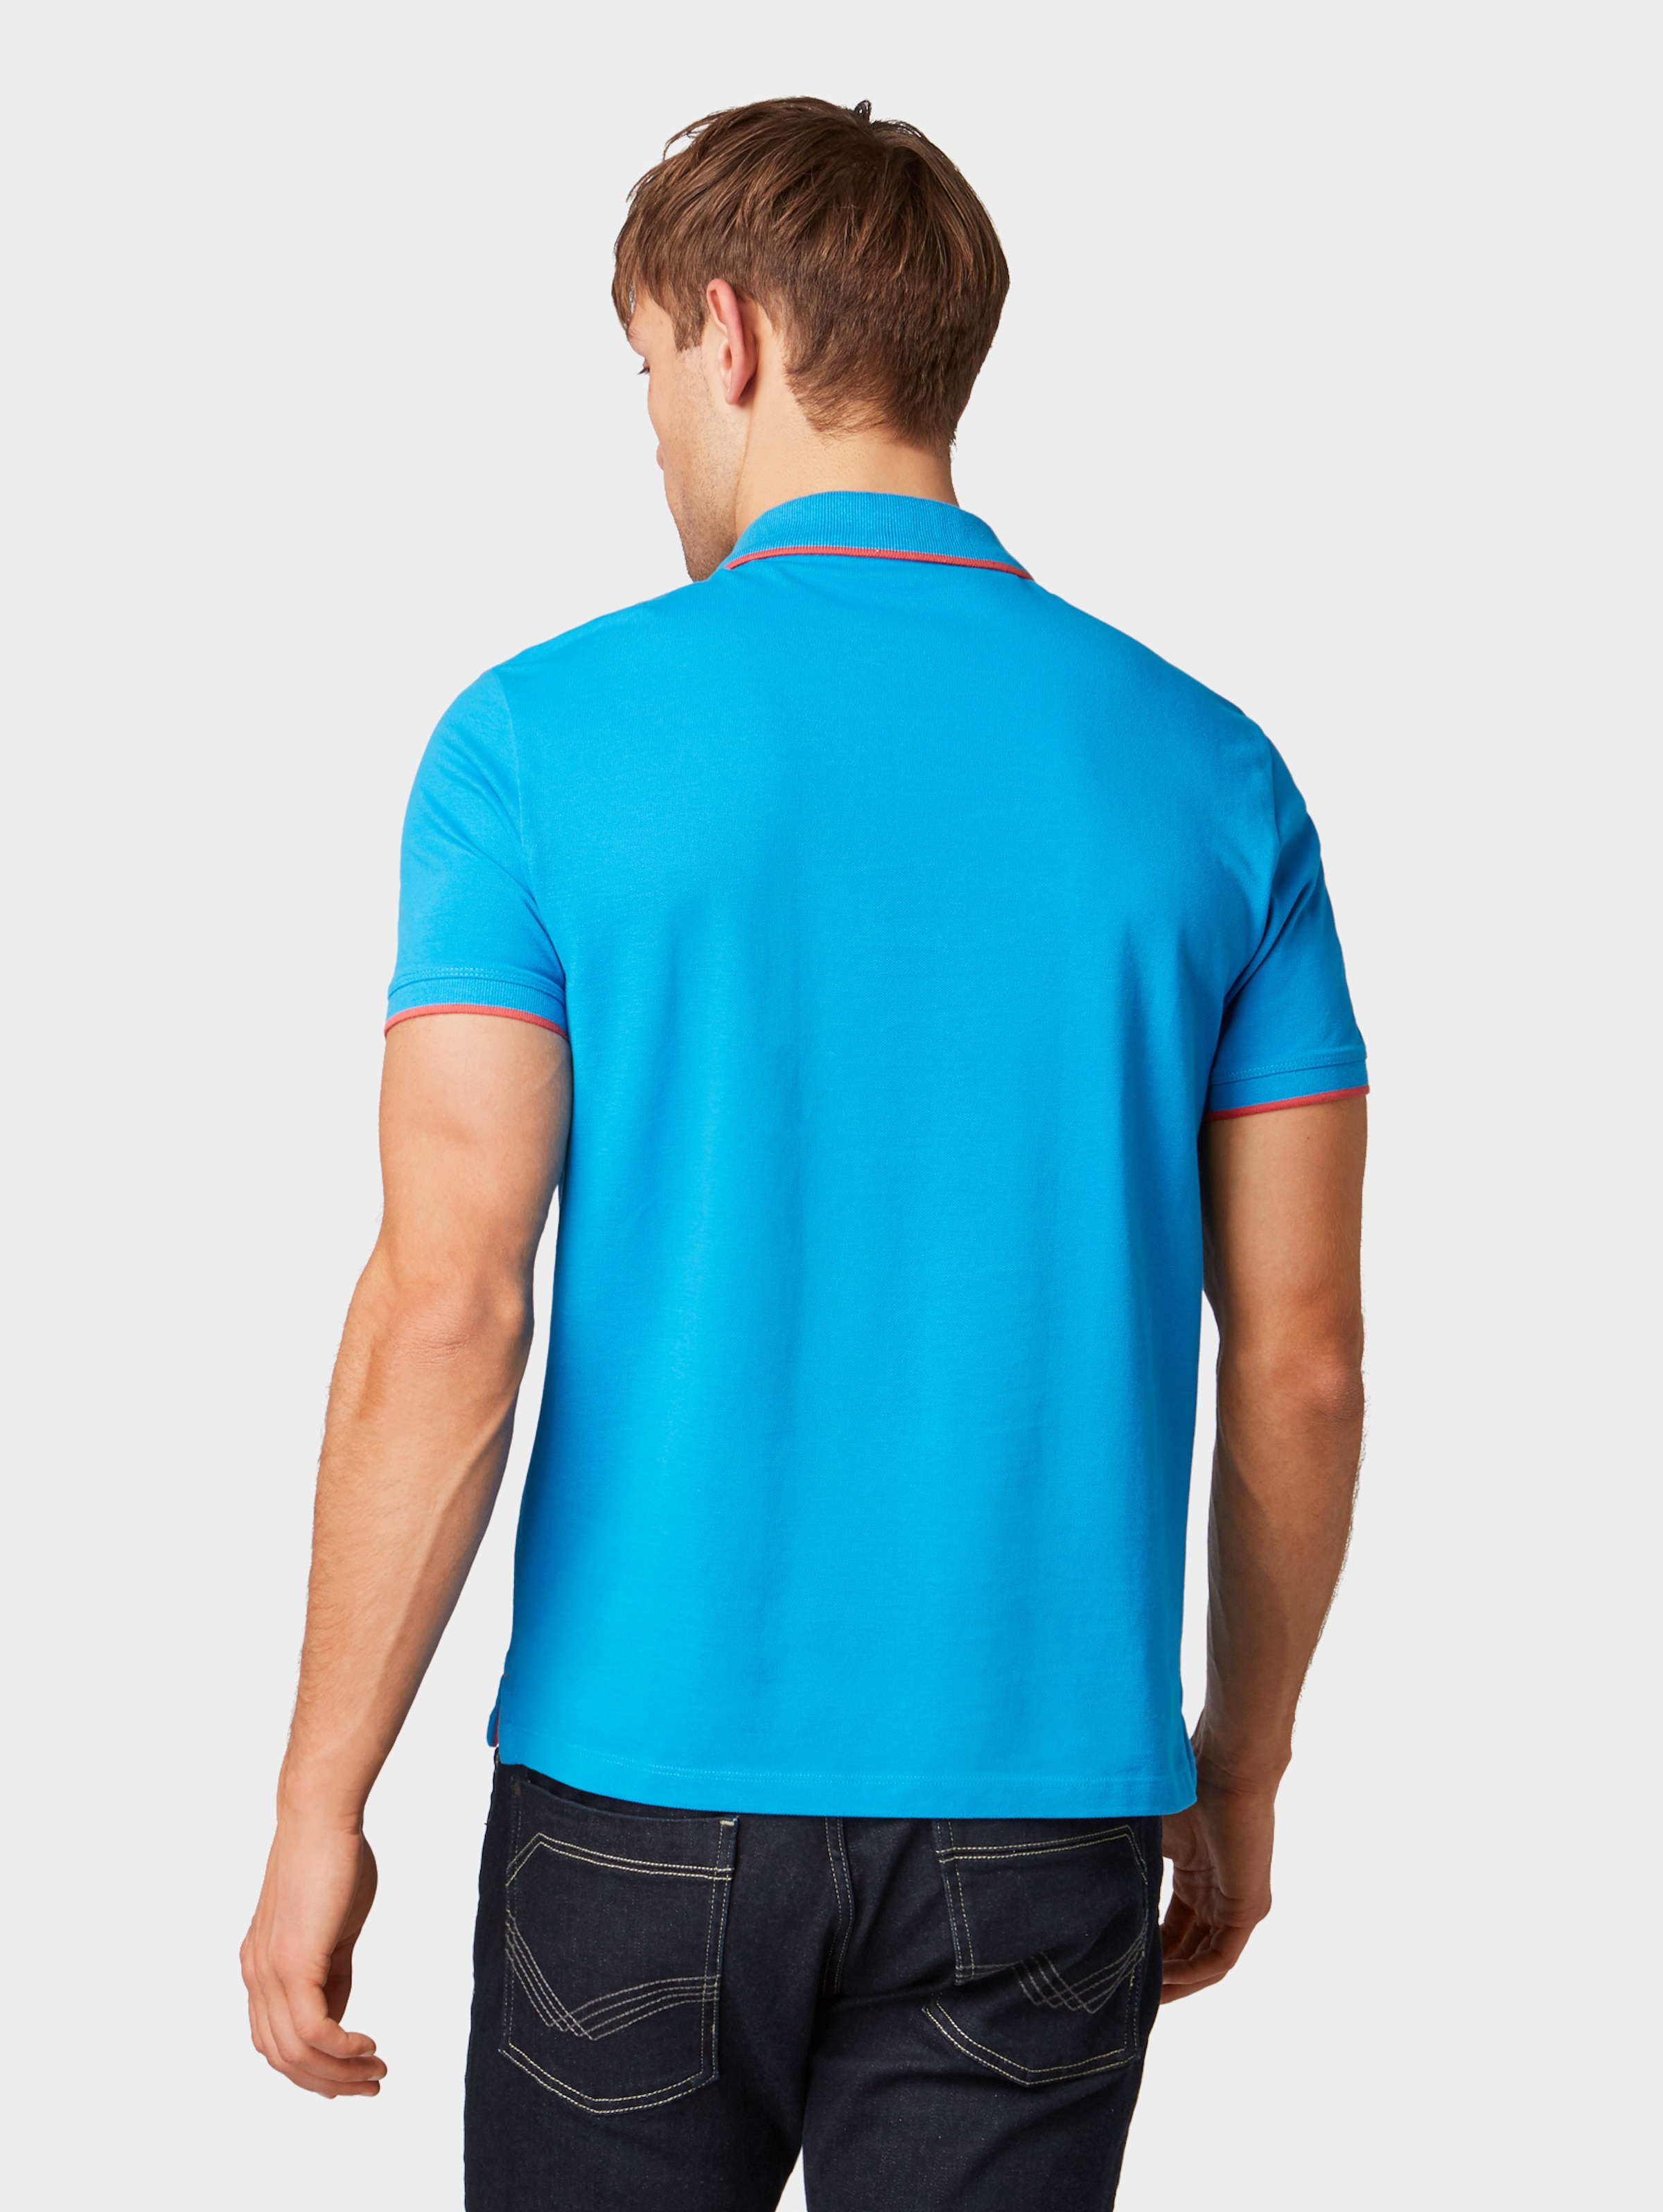 Lachs Tailor In Poloshirt Tom NachtblauNeonblau drsthQCx